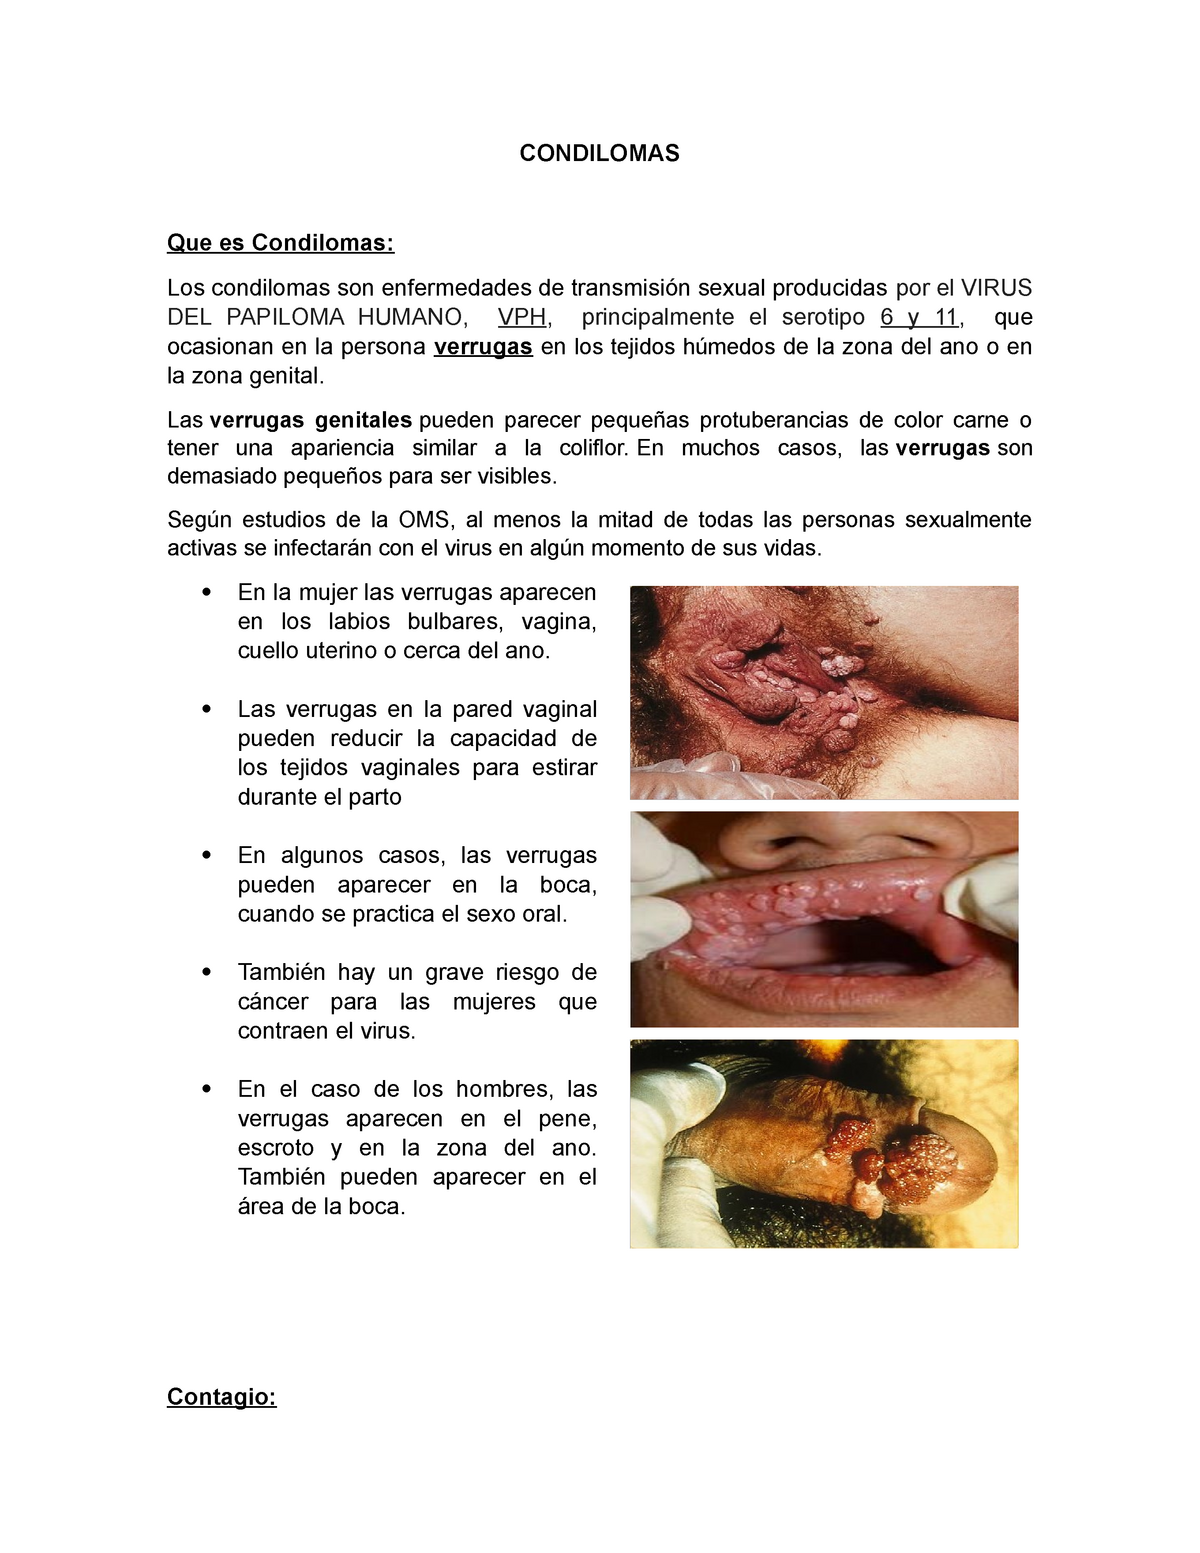 virus del papiloma grave)